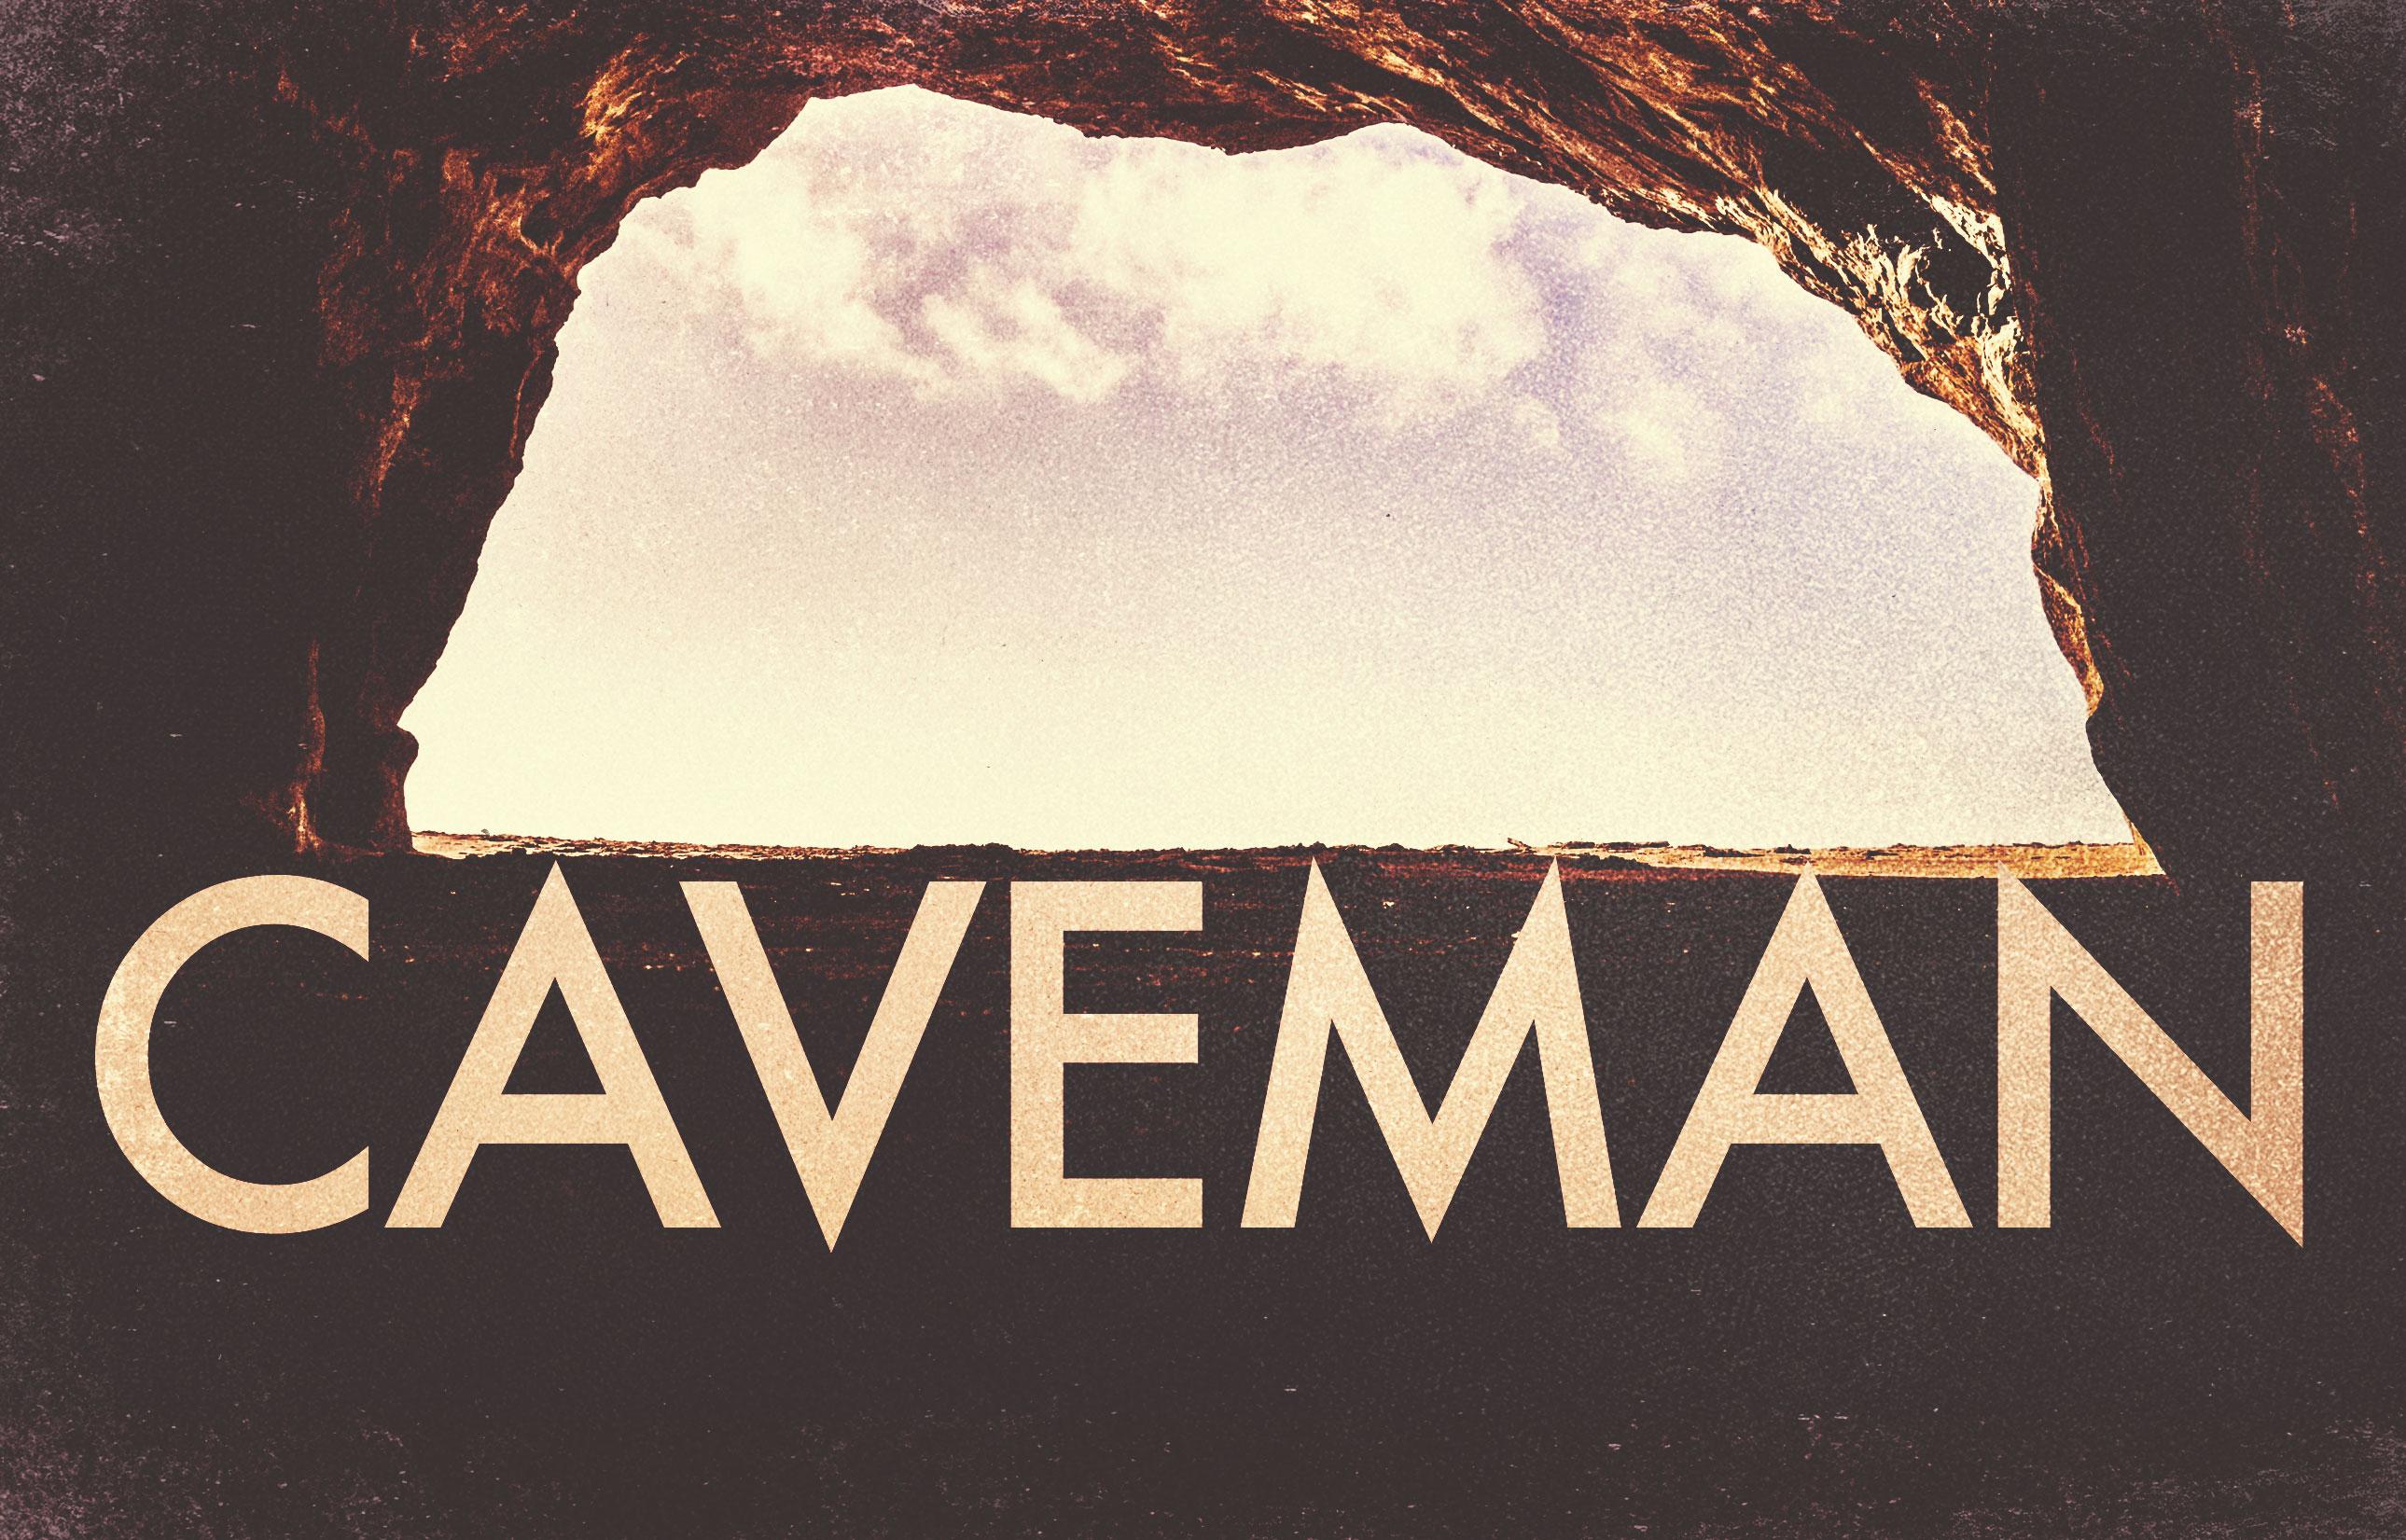 Caveman banner